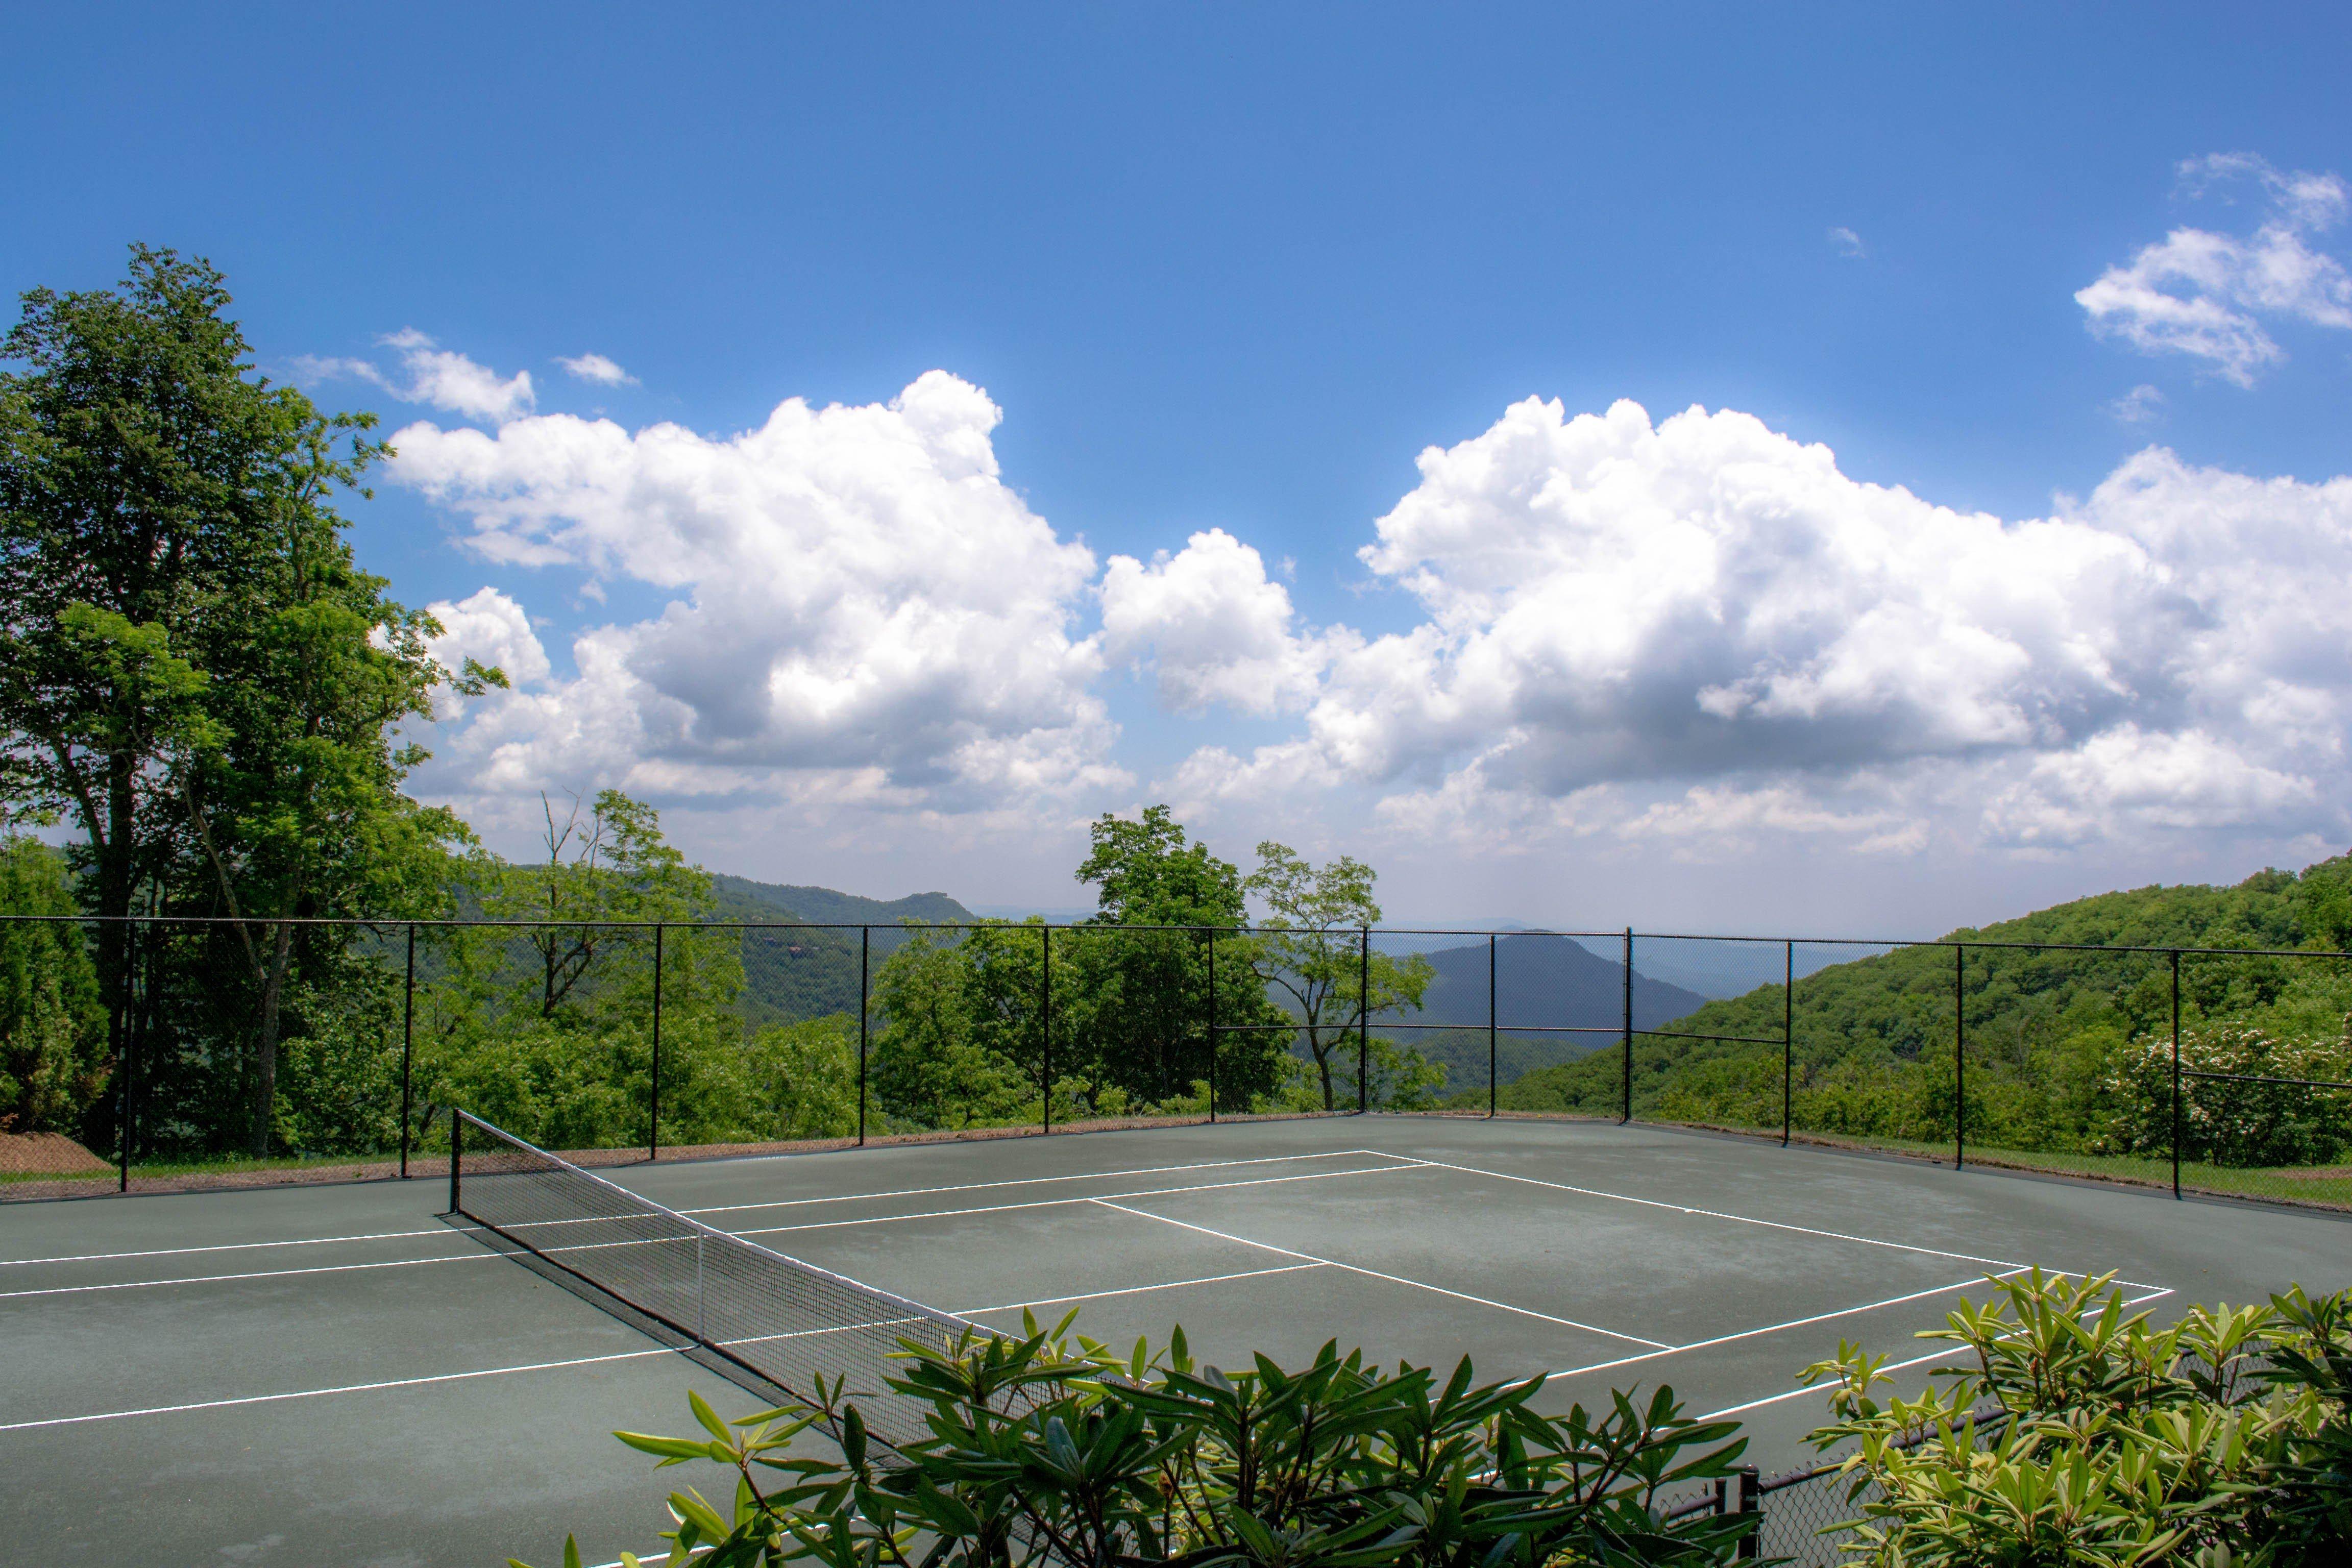 Tennis court on the estate